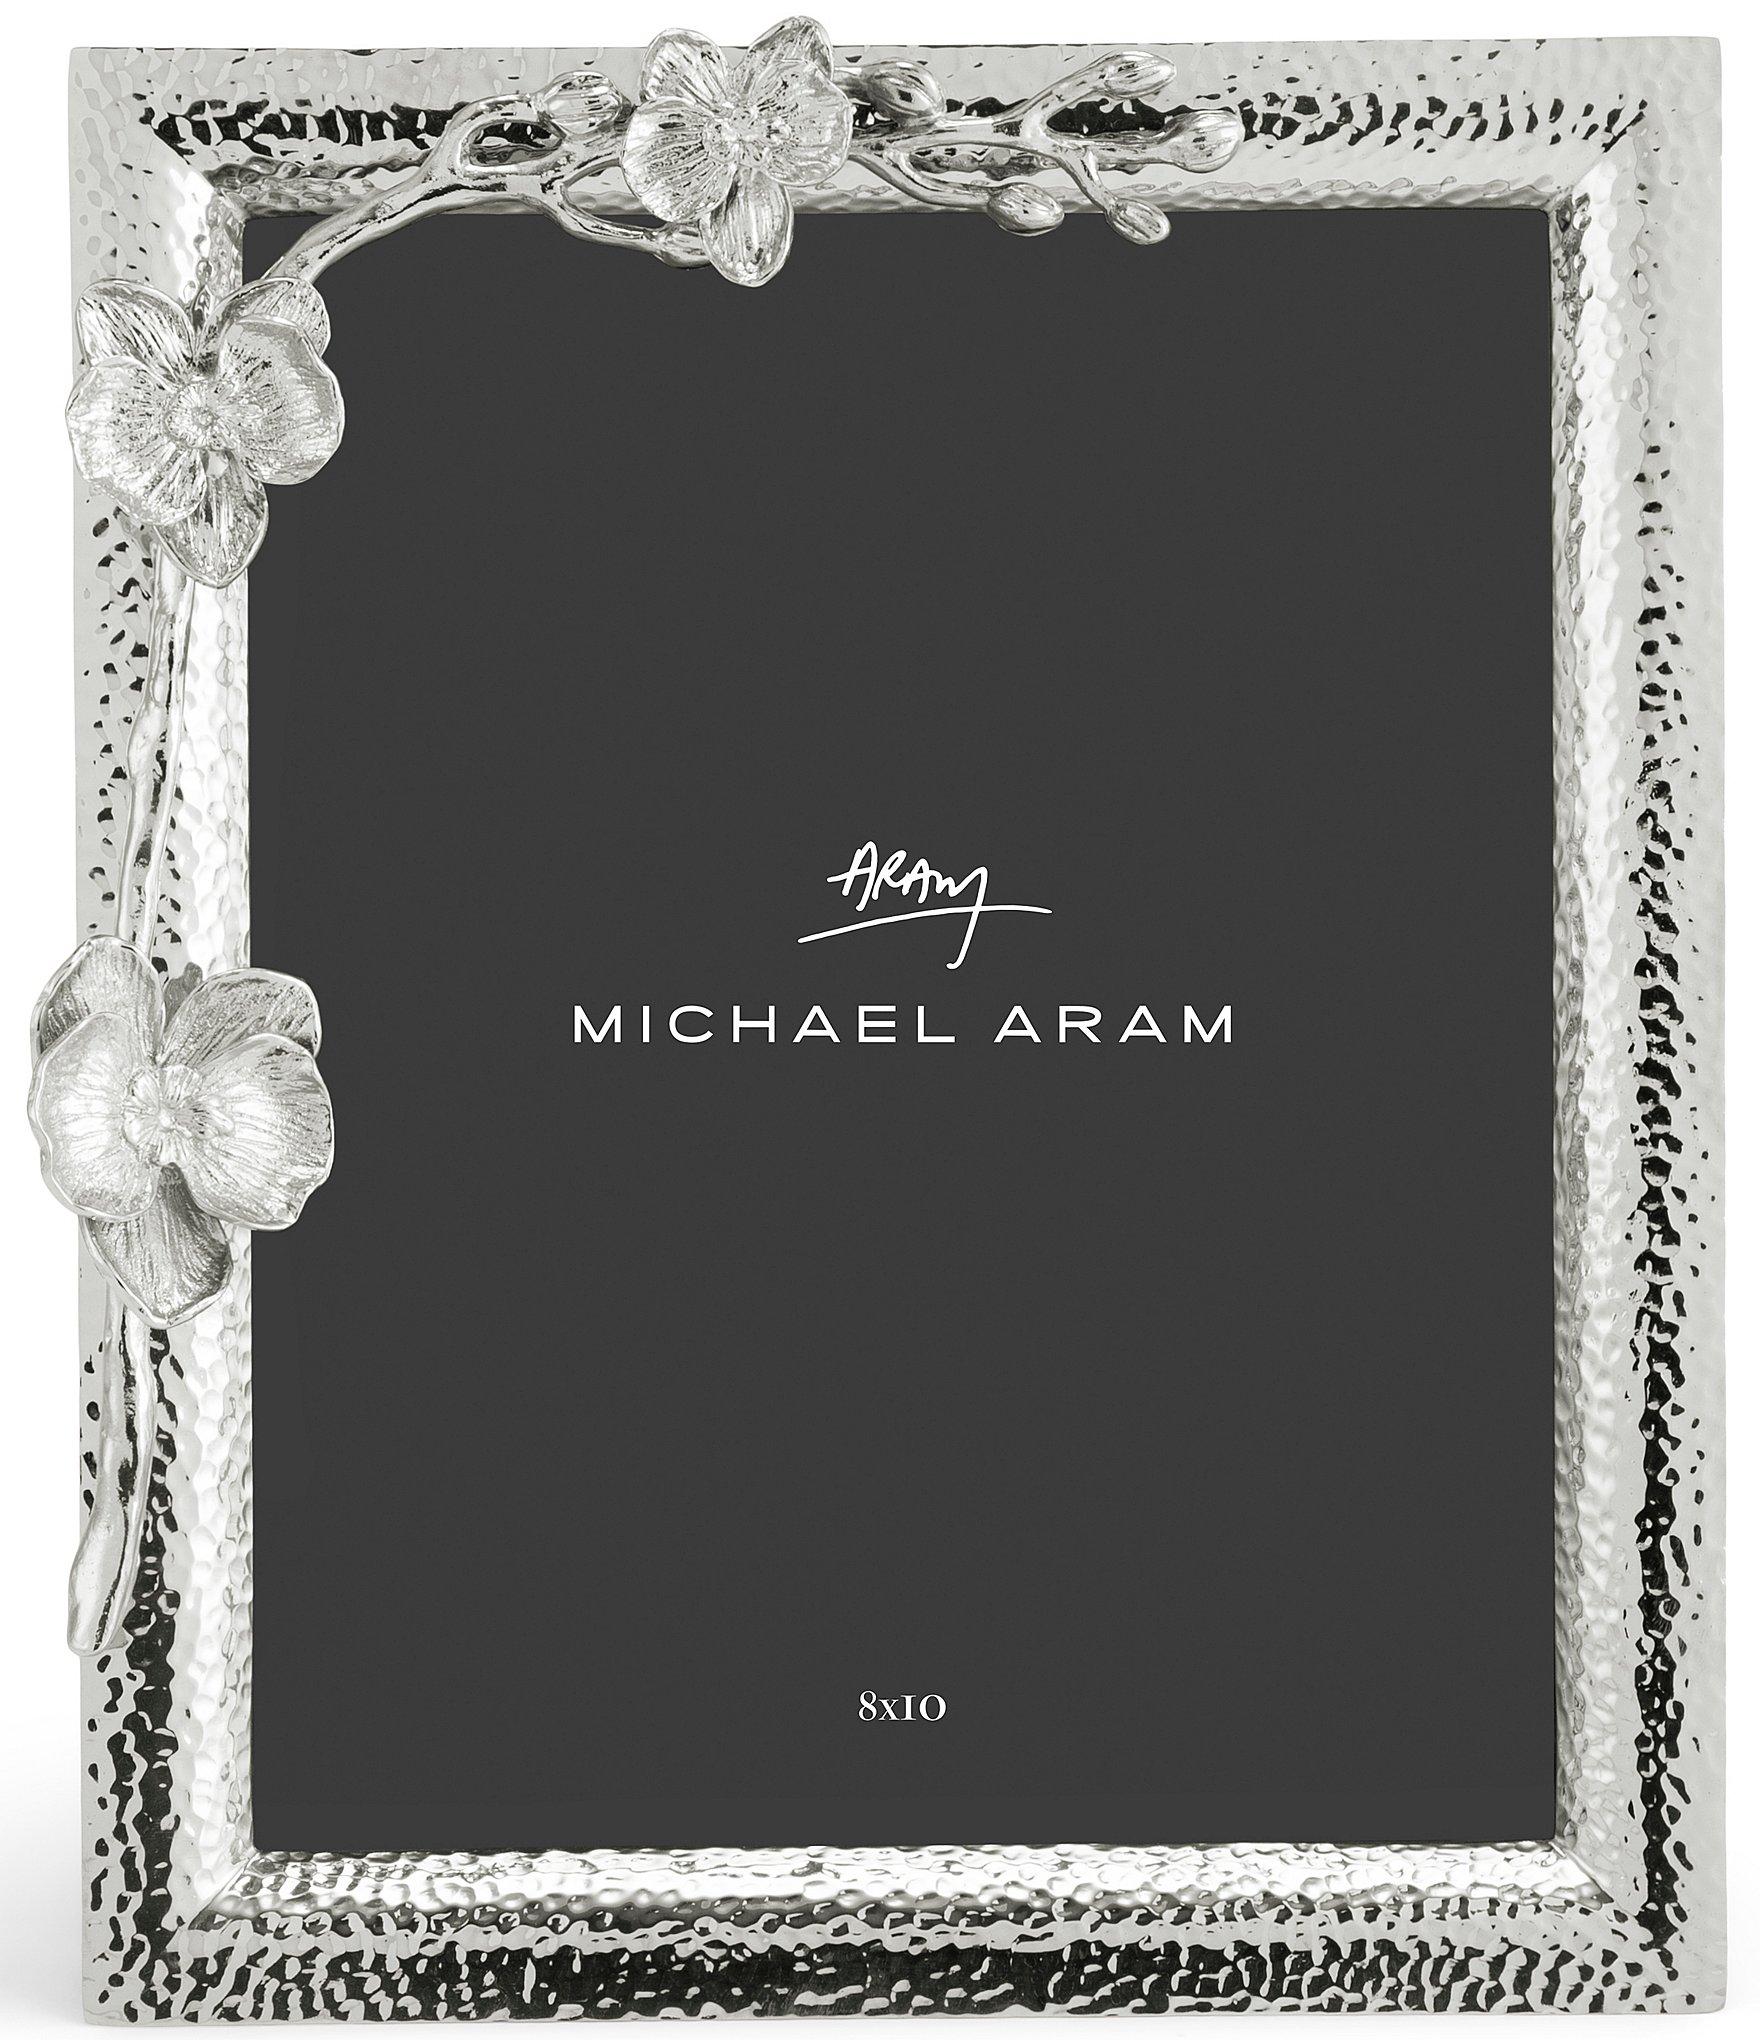 michael aram home dillardscom - Michael Aram Picture Frames